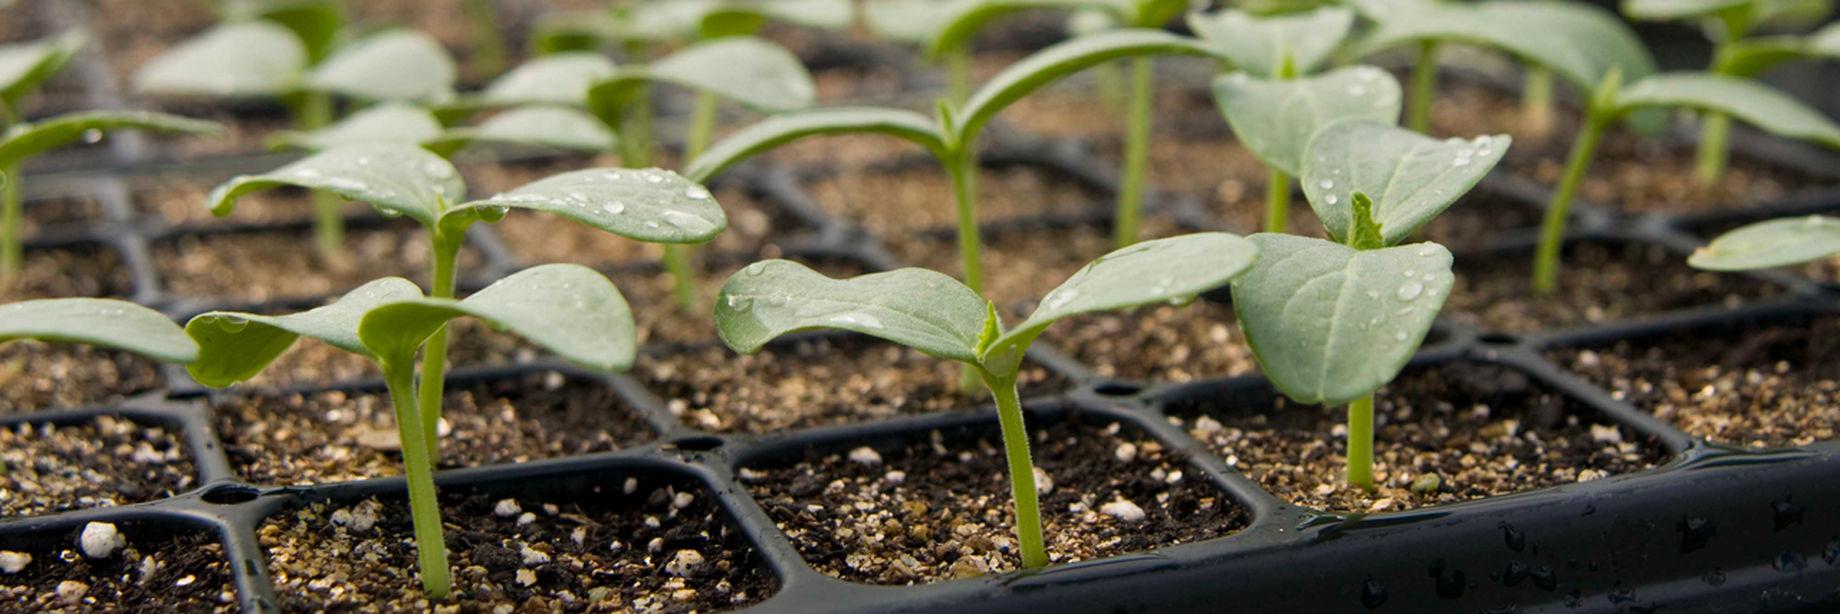 Herb Seeds Plants, Seeds & Bulbs Enthusiastic Ashitaba 50 Seeds Angelica Keiskei Herb Top Watermelons